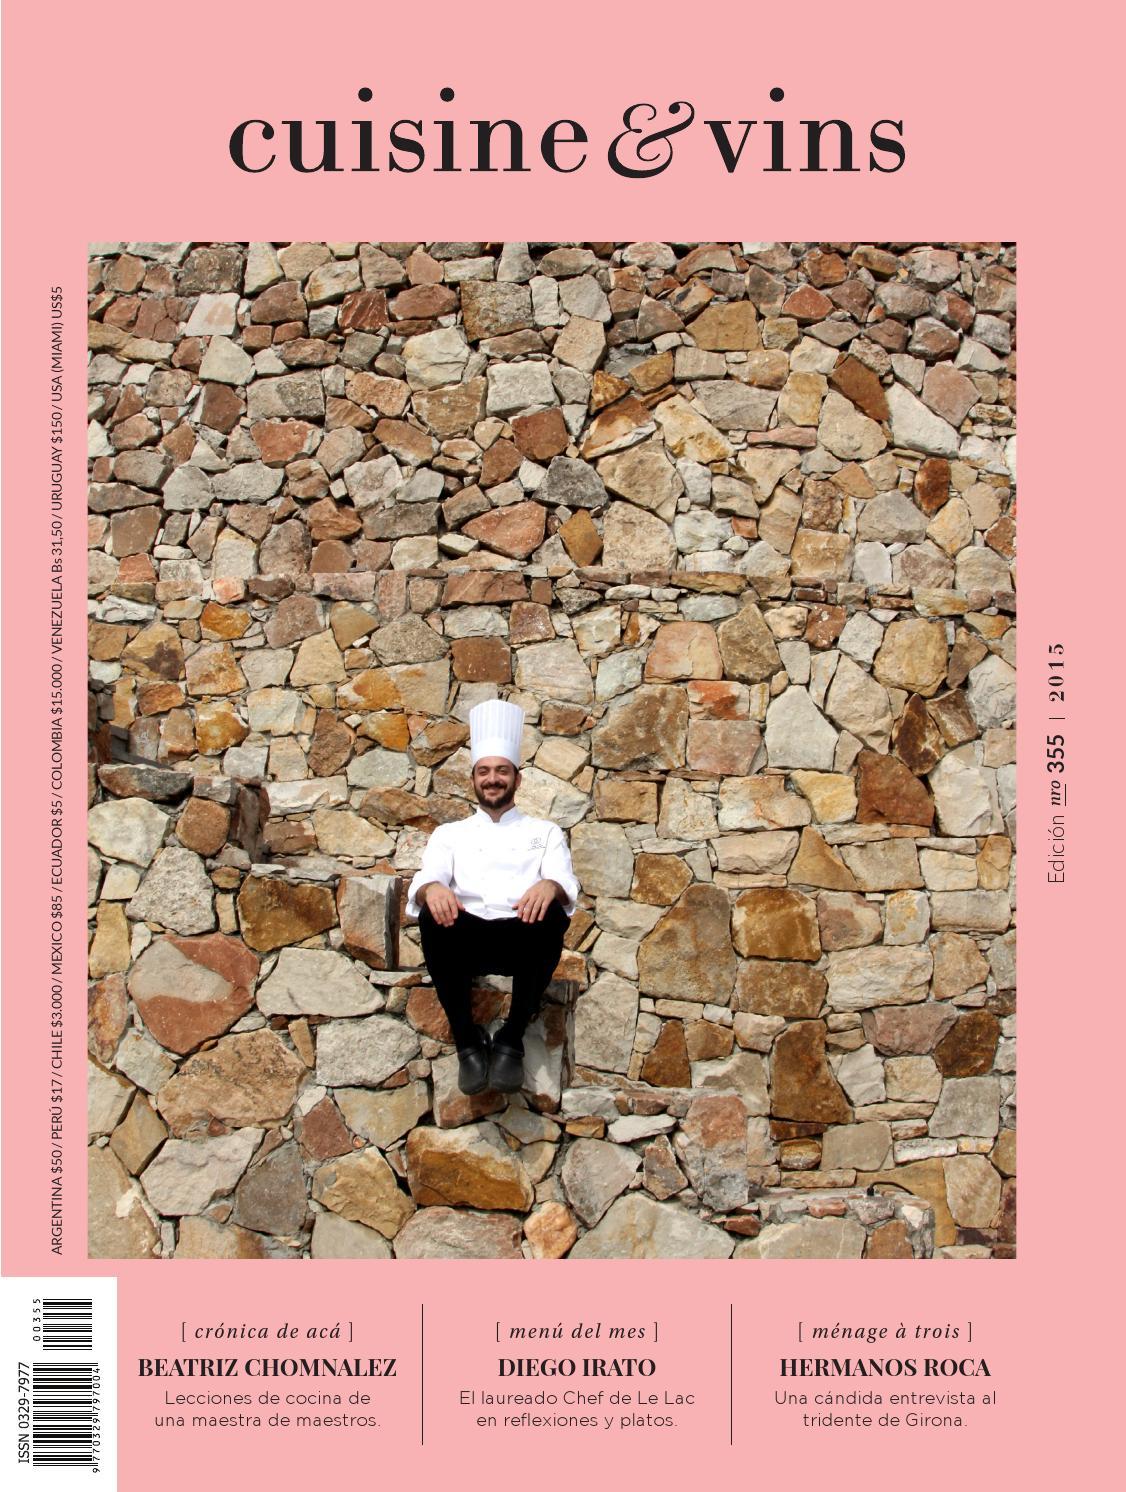 teaser: cuisine&vins #355 by cuisine&vins - issuu